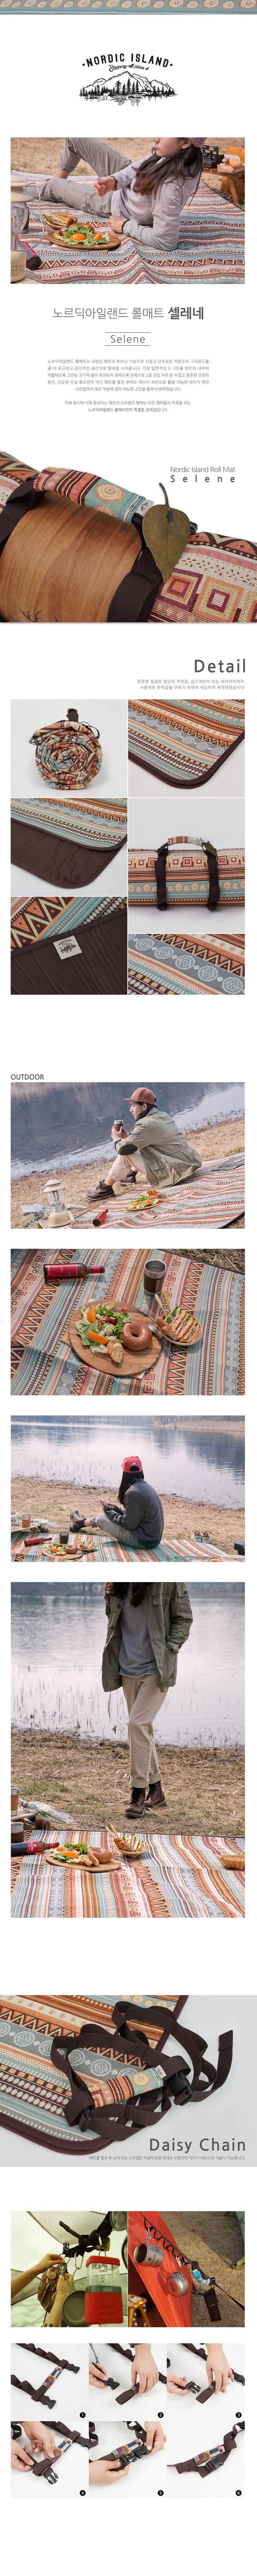 NORDIC ISLAND | Roll mat防水野餐墊 (Selene)